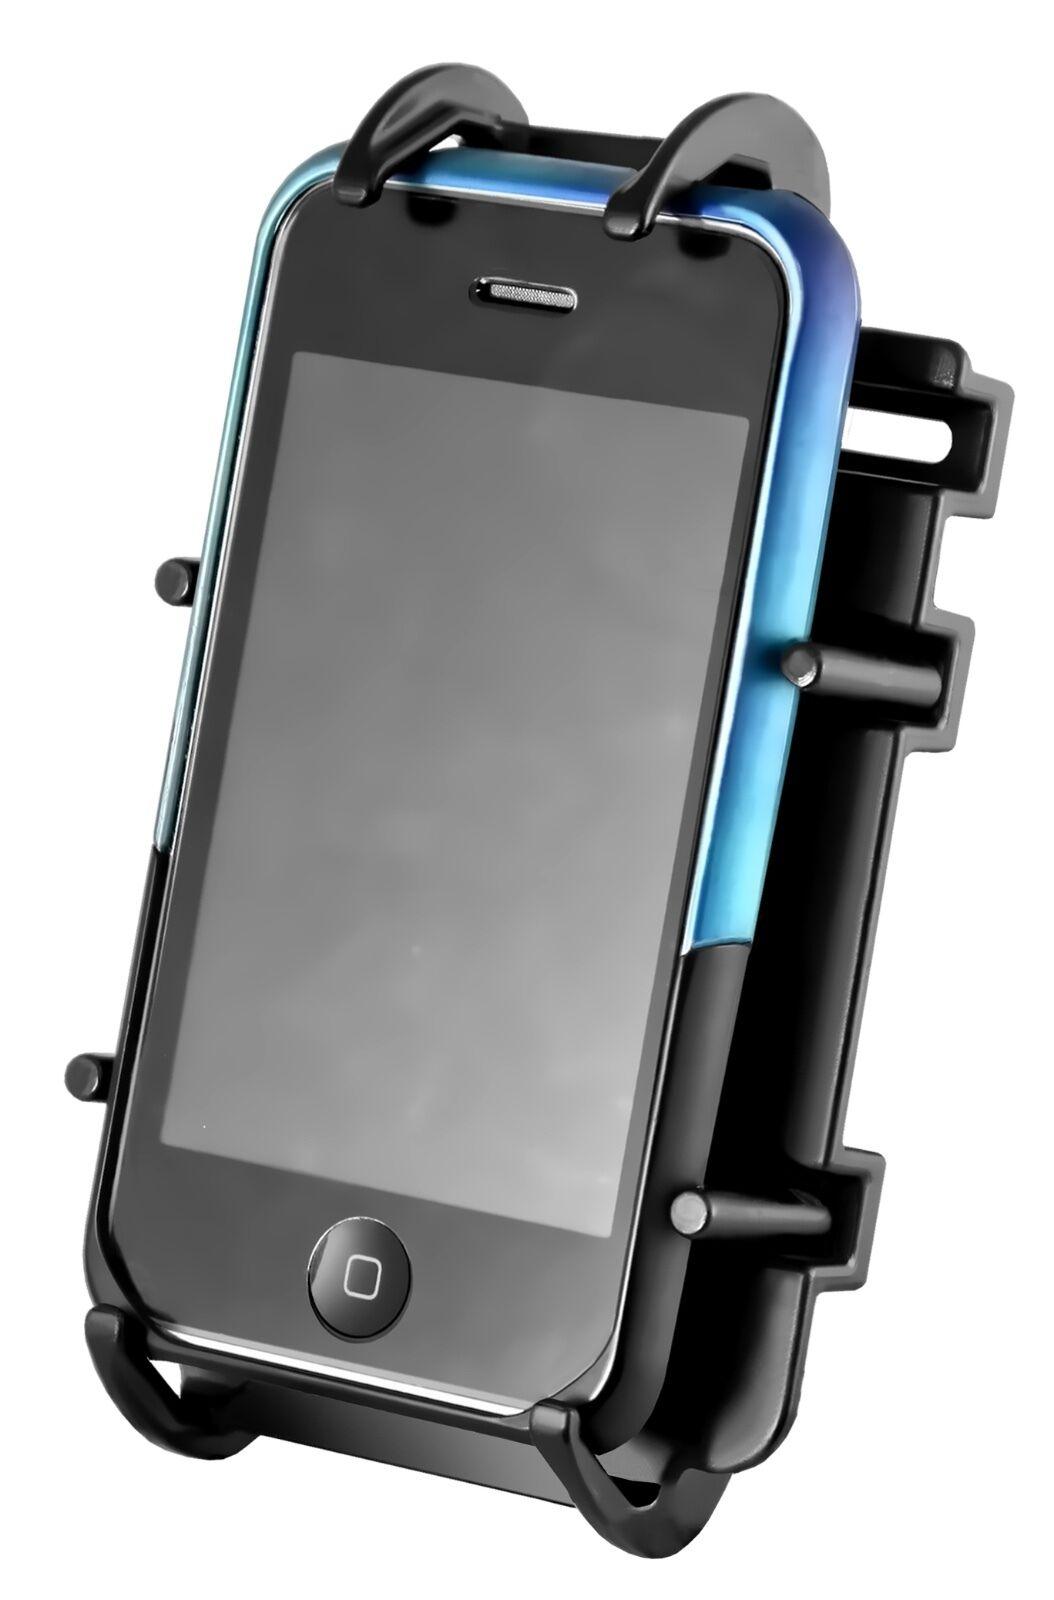 RAM MOUNTS (RAM-HOL-PD3U Universal Spring Loaded Cell Phone